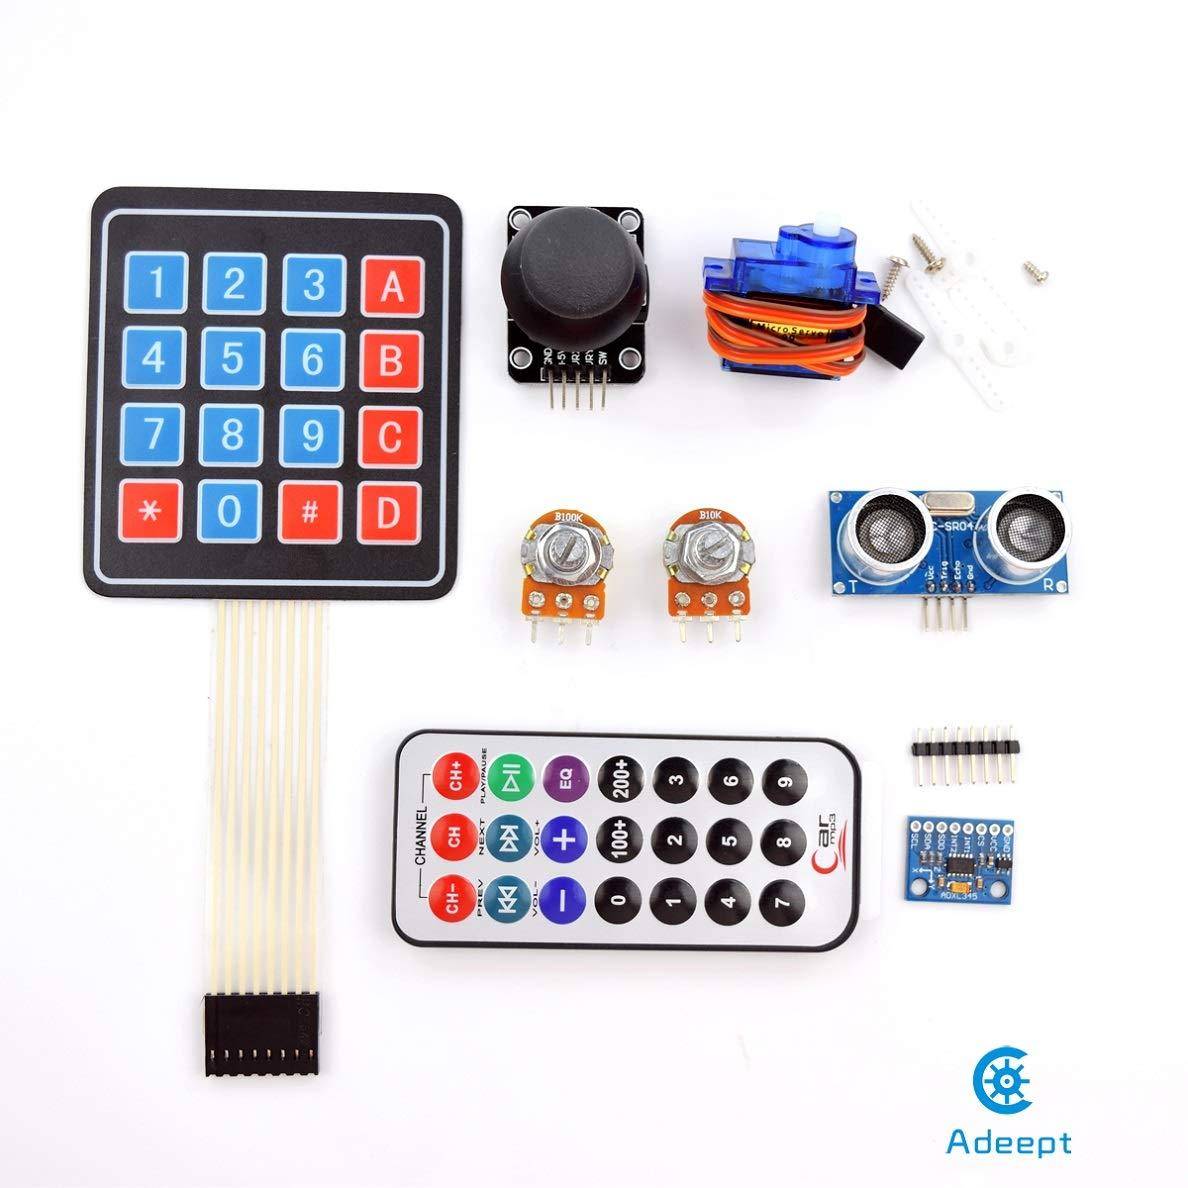 Adeept RFID RFID RFID Starter Kit for Arduino UNO R3, Servo, RC522 RFID Module, PS2 Joystick, Arduino Beginner Starter Learning Kit with PDF Guidebook and C Code 8e6416